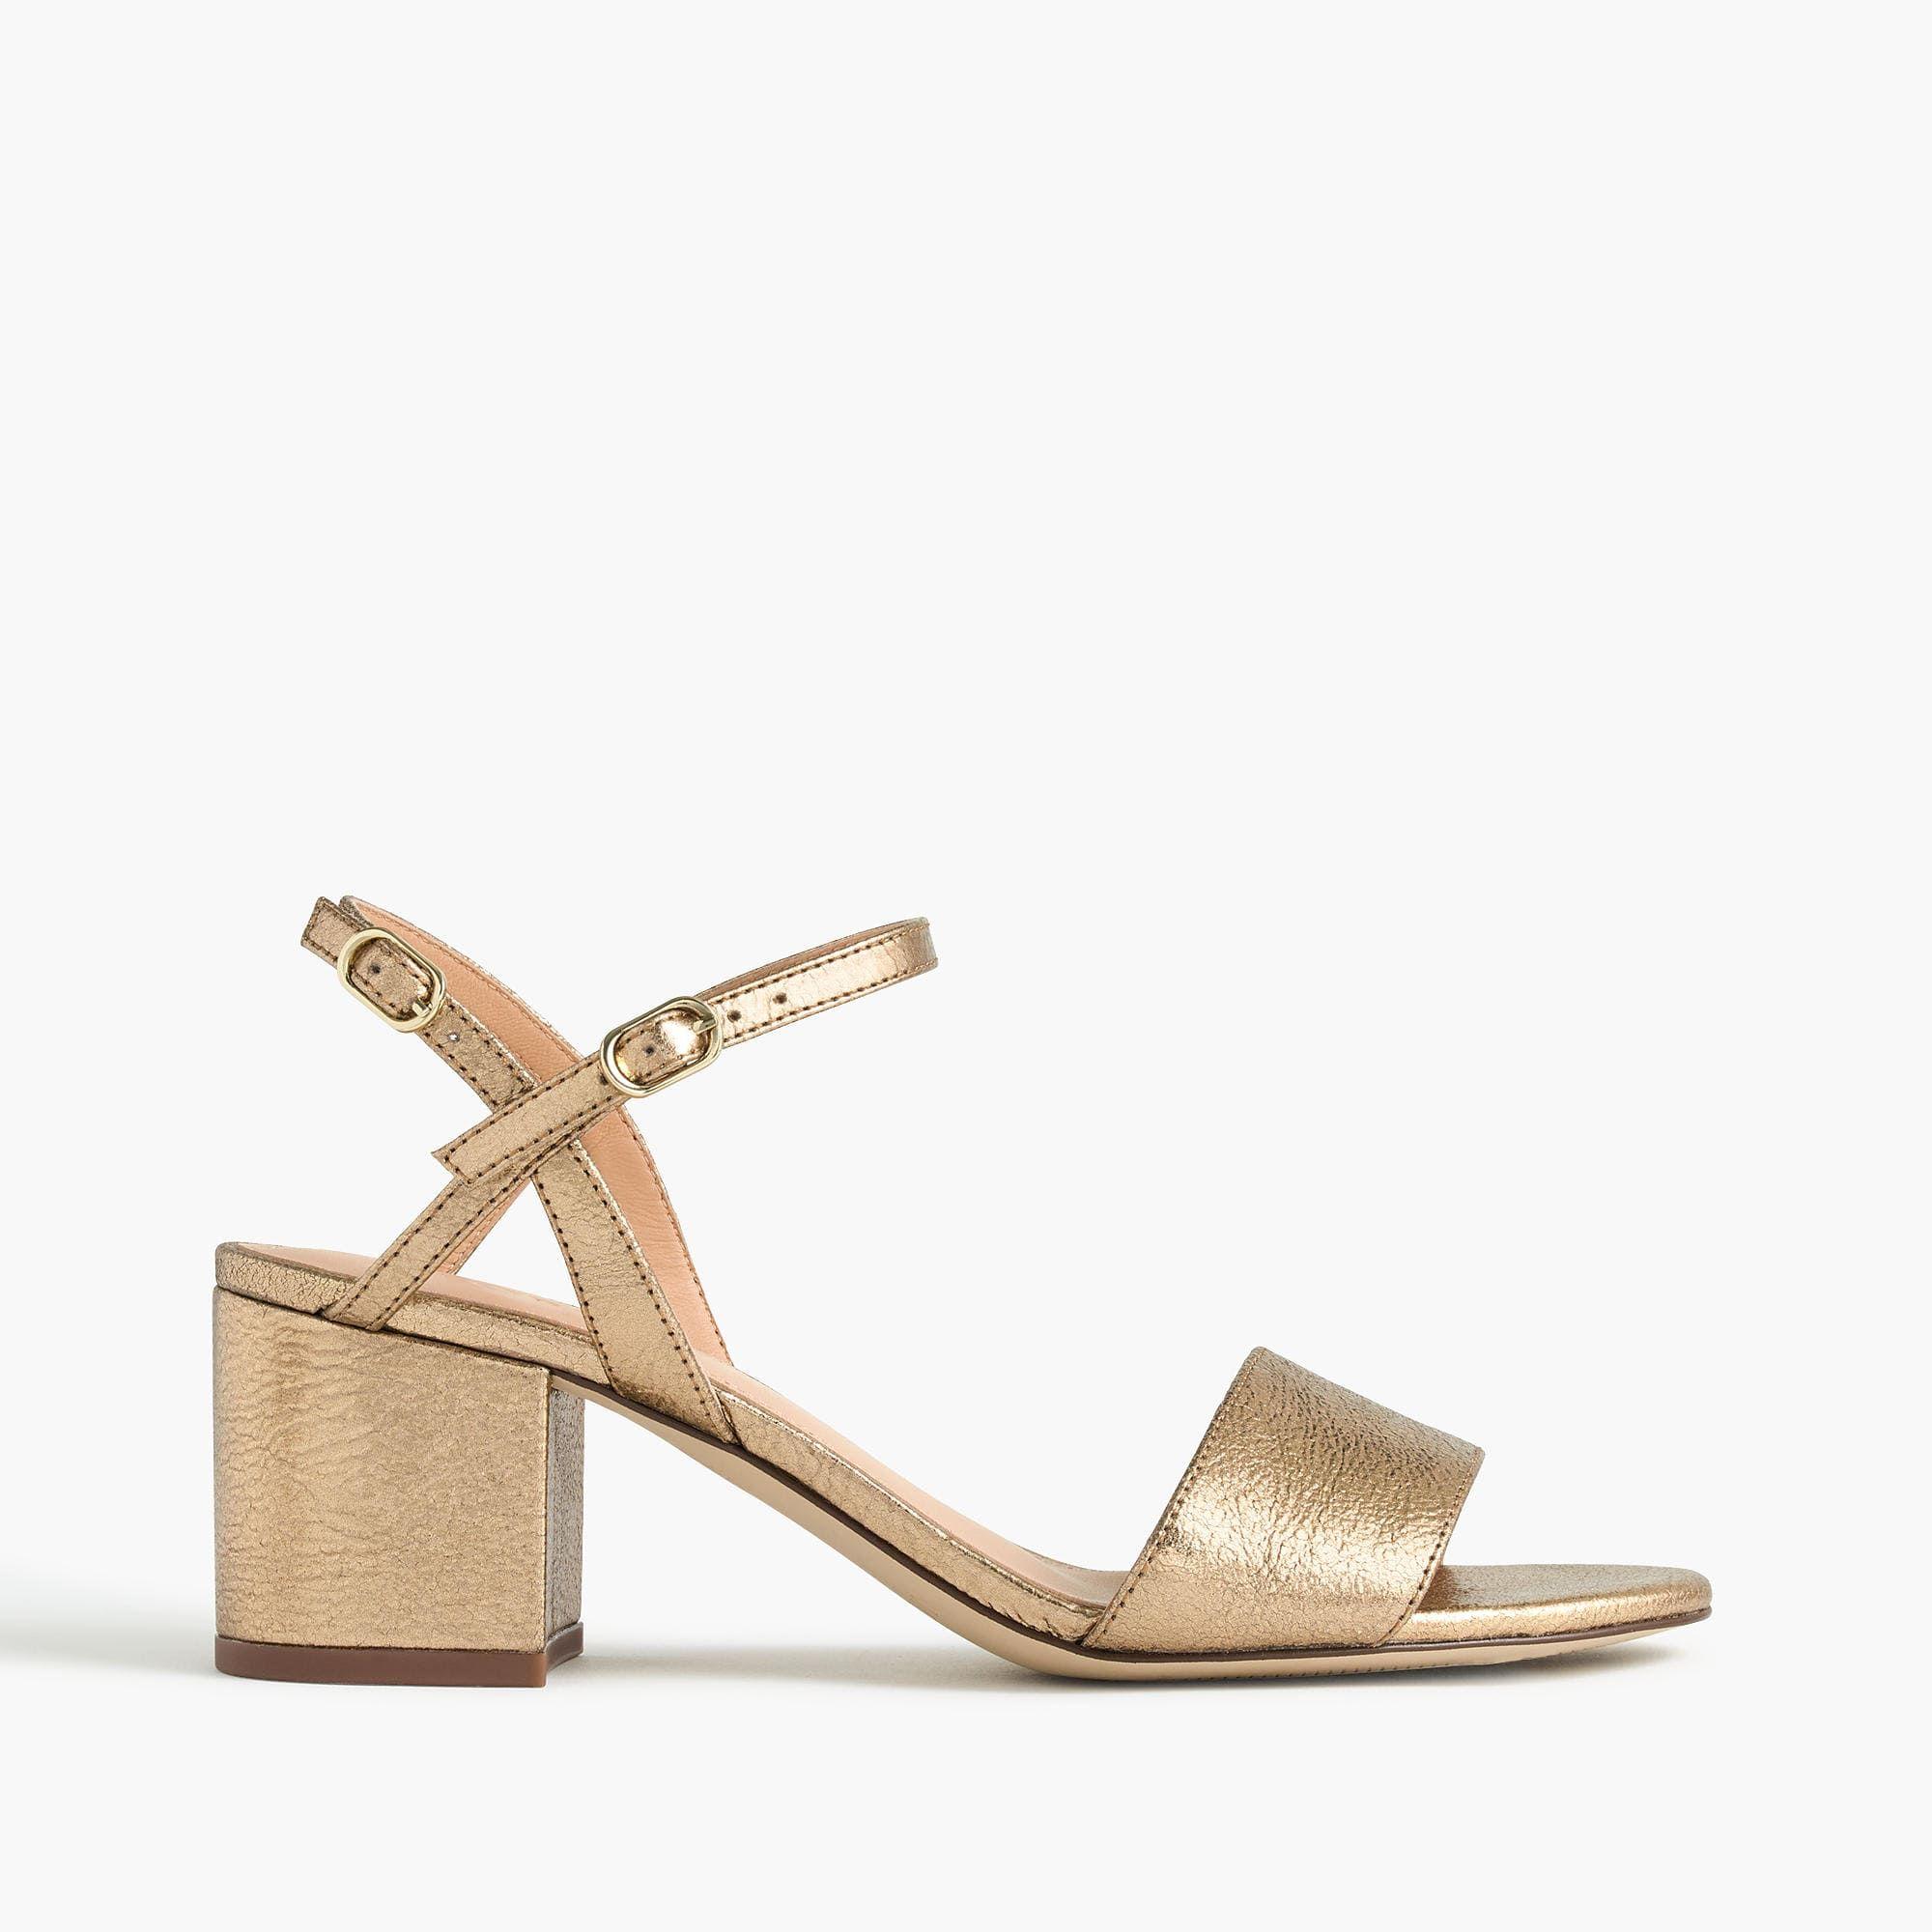 b4686ef23e7 J.Crew - Strappy block-heel sandals in metallic gold | 2018 in 2019 ...